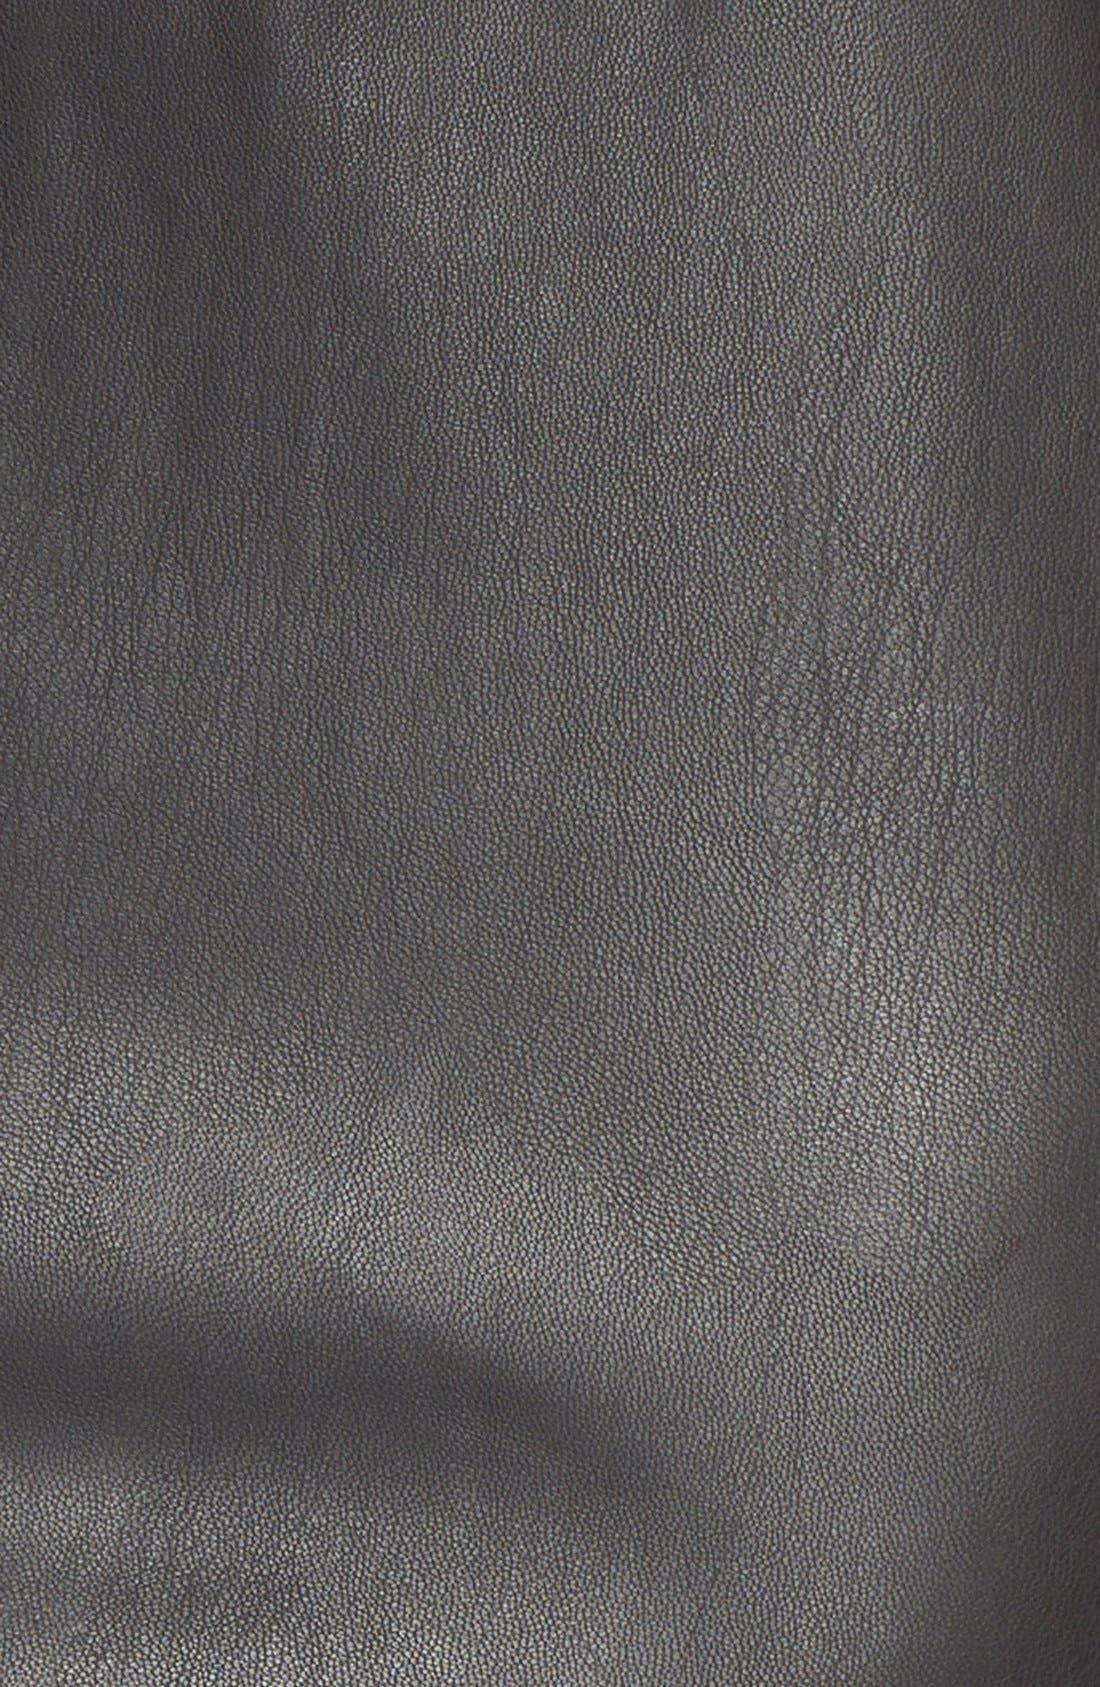 JUNAROSE,                             'Kanya' Faux Leather Shift Dress,                             Alternate thumbnail 4, color,                             001